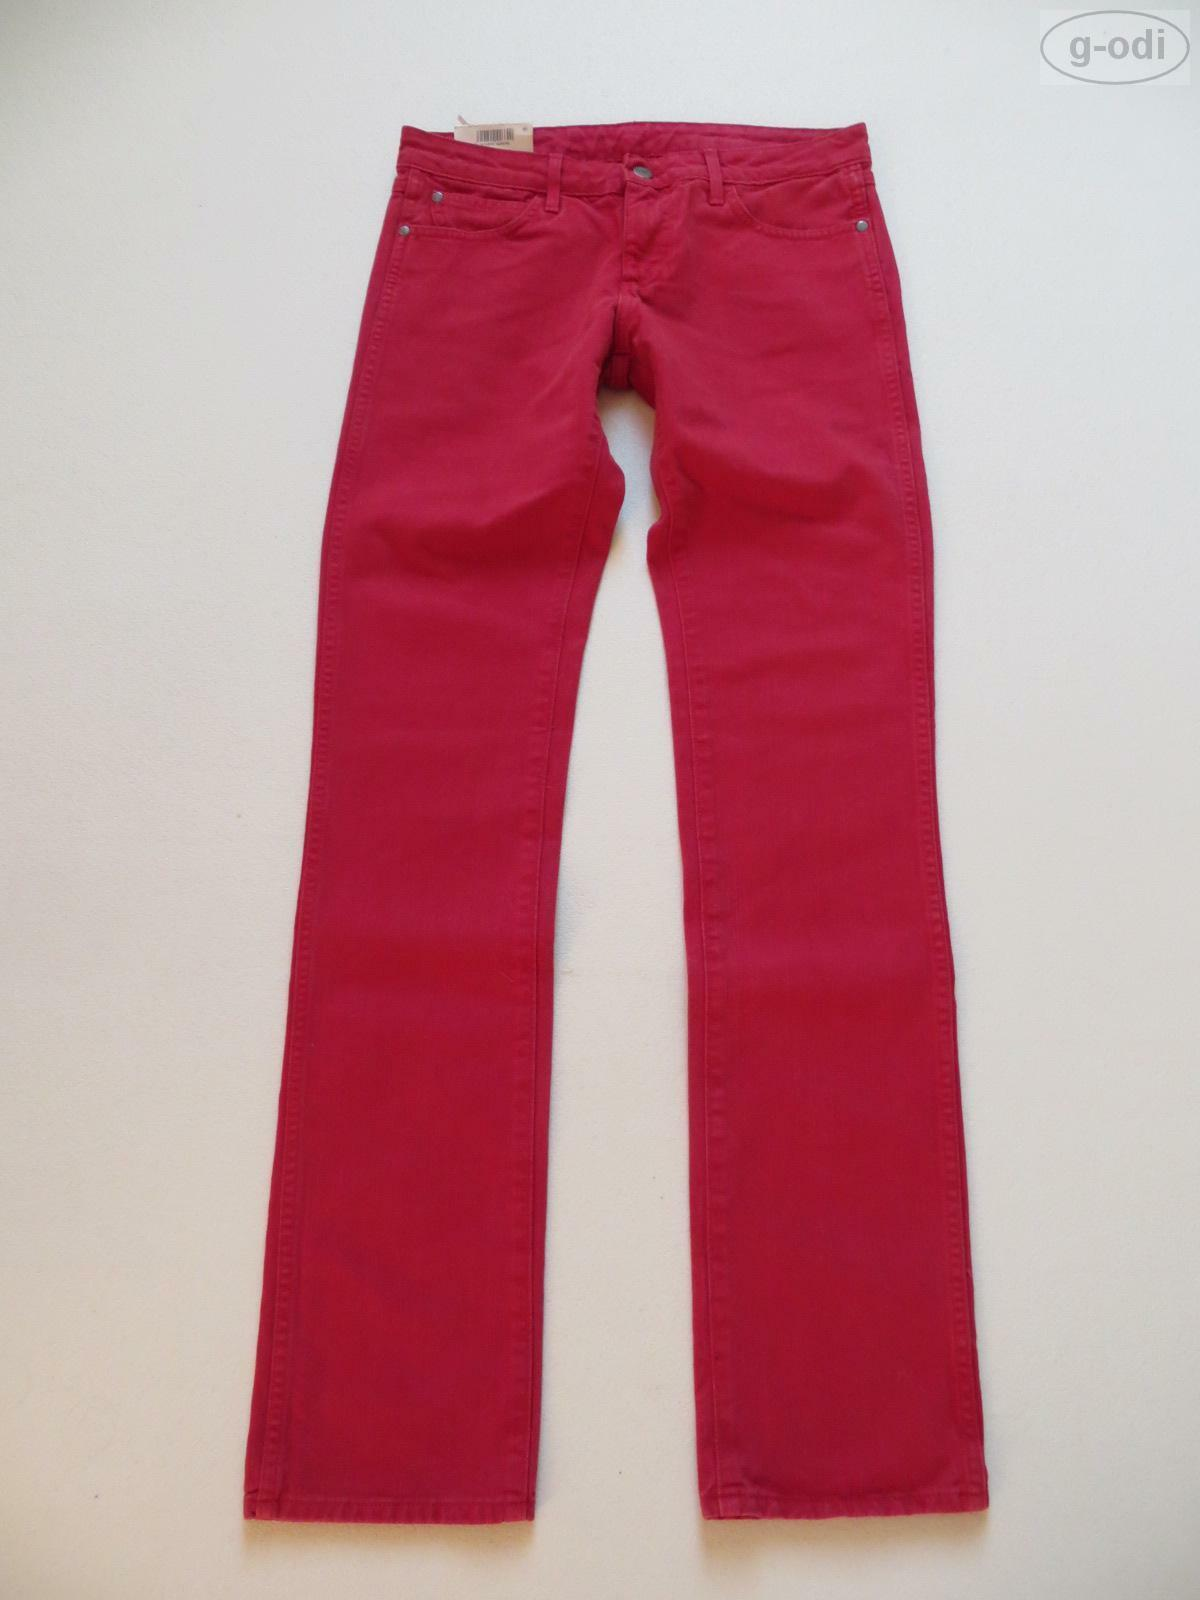 Wrangler LIA Slim Leg Jeans Hose W 29  L 34 rot NEU   rot Colourot Denim